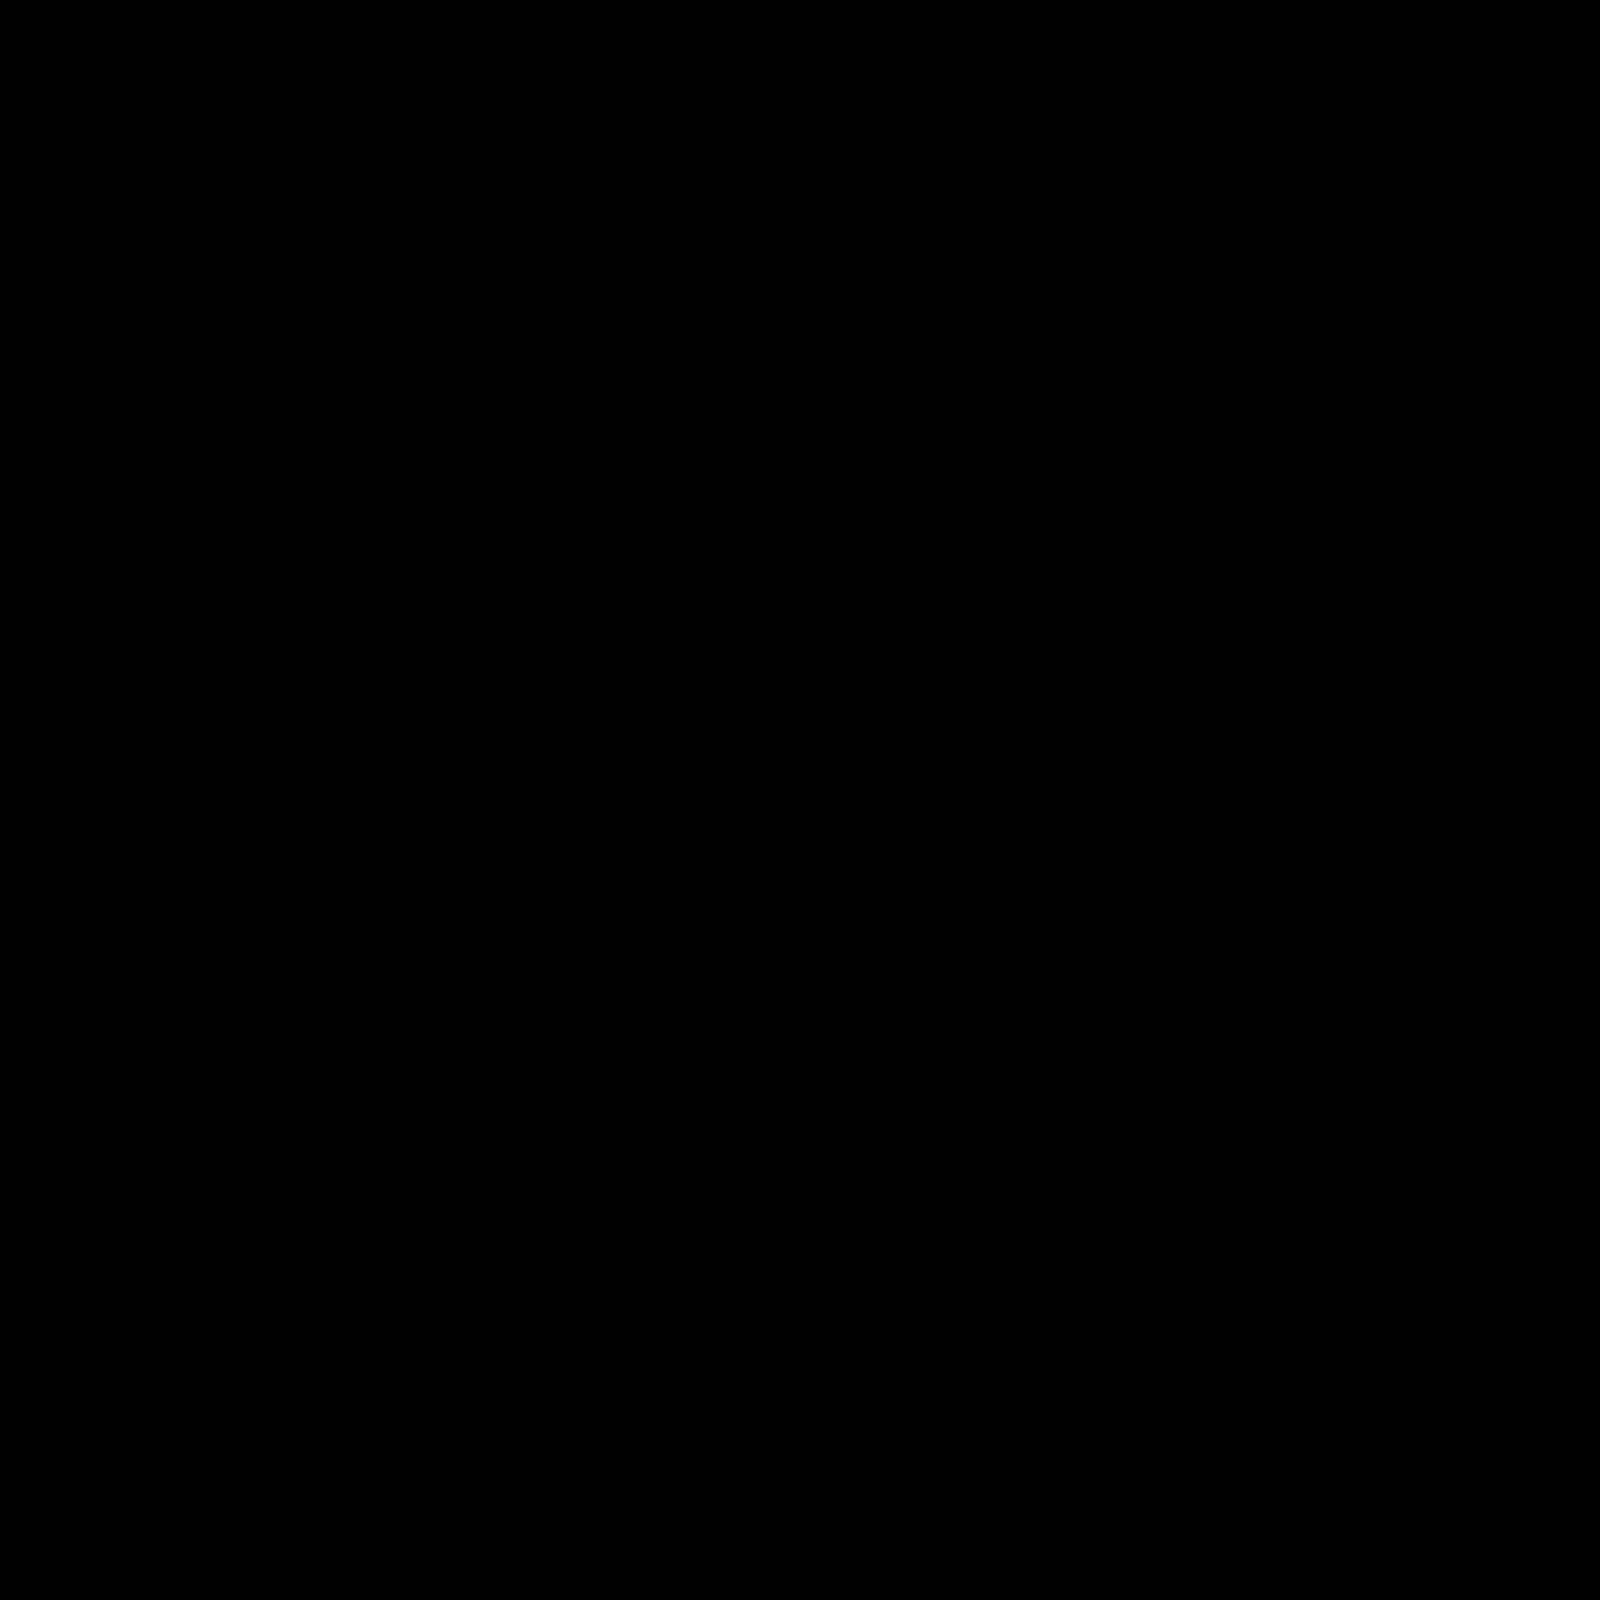 Share 3 icon